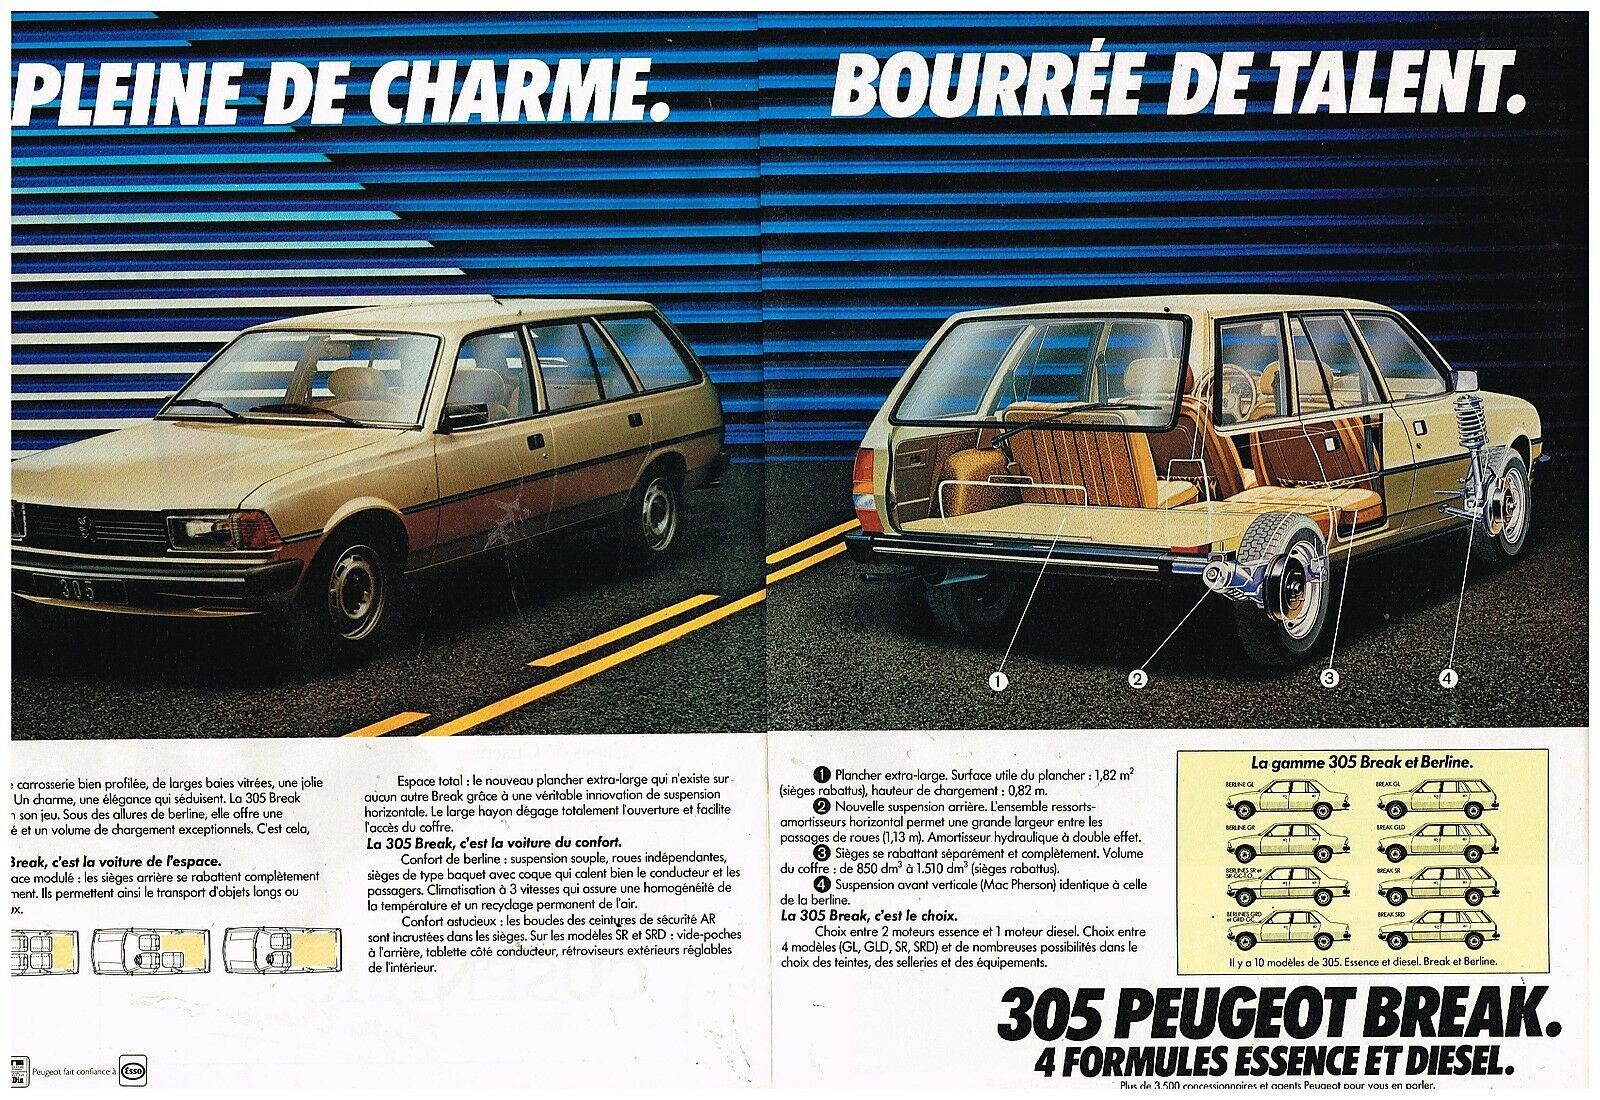 1980 Peugeot 305 Break